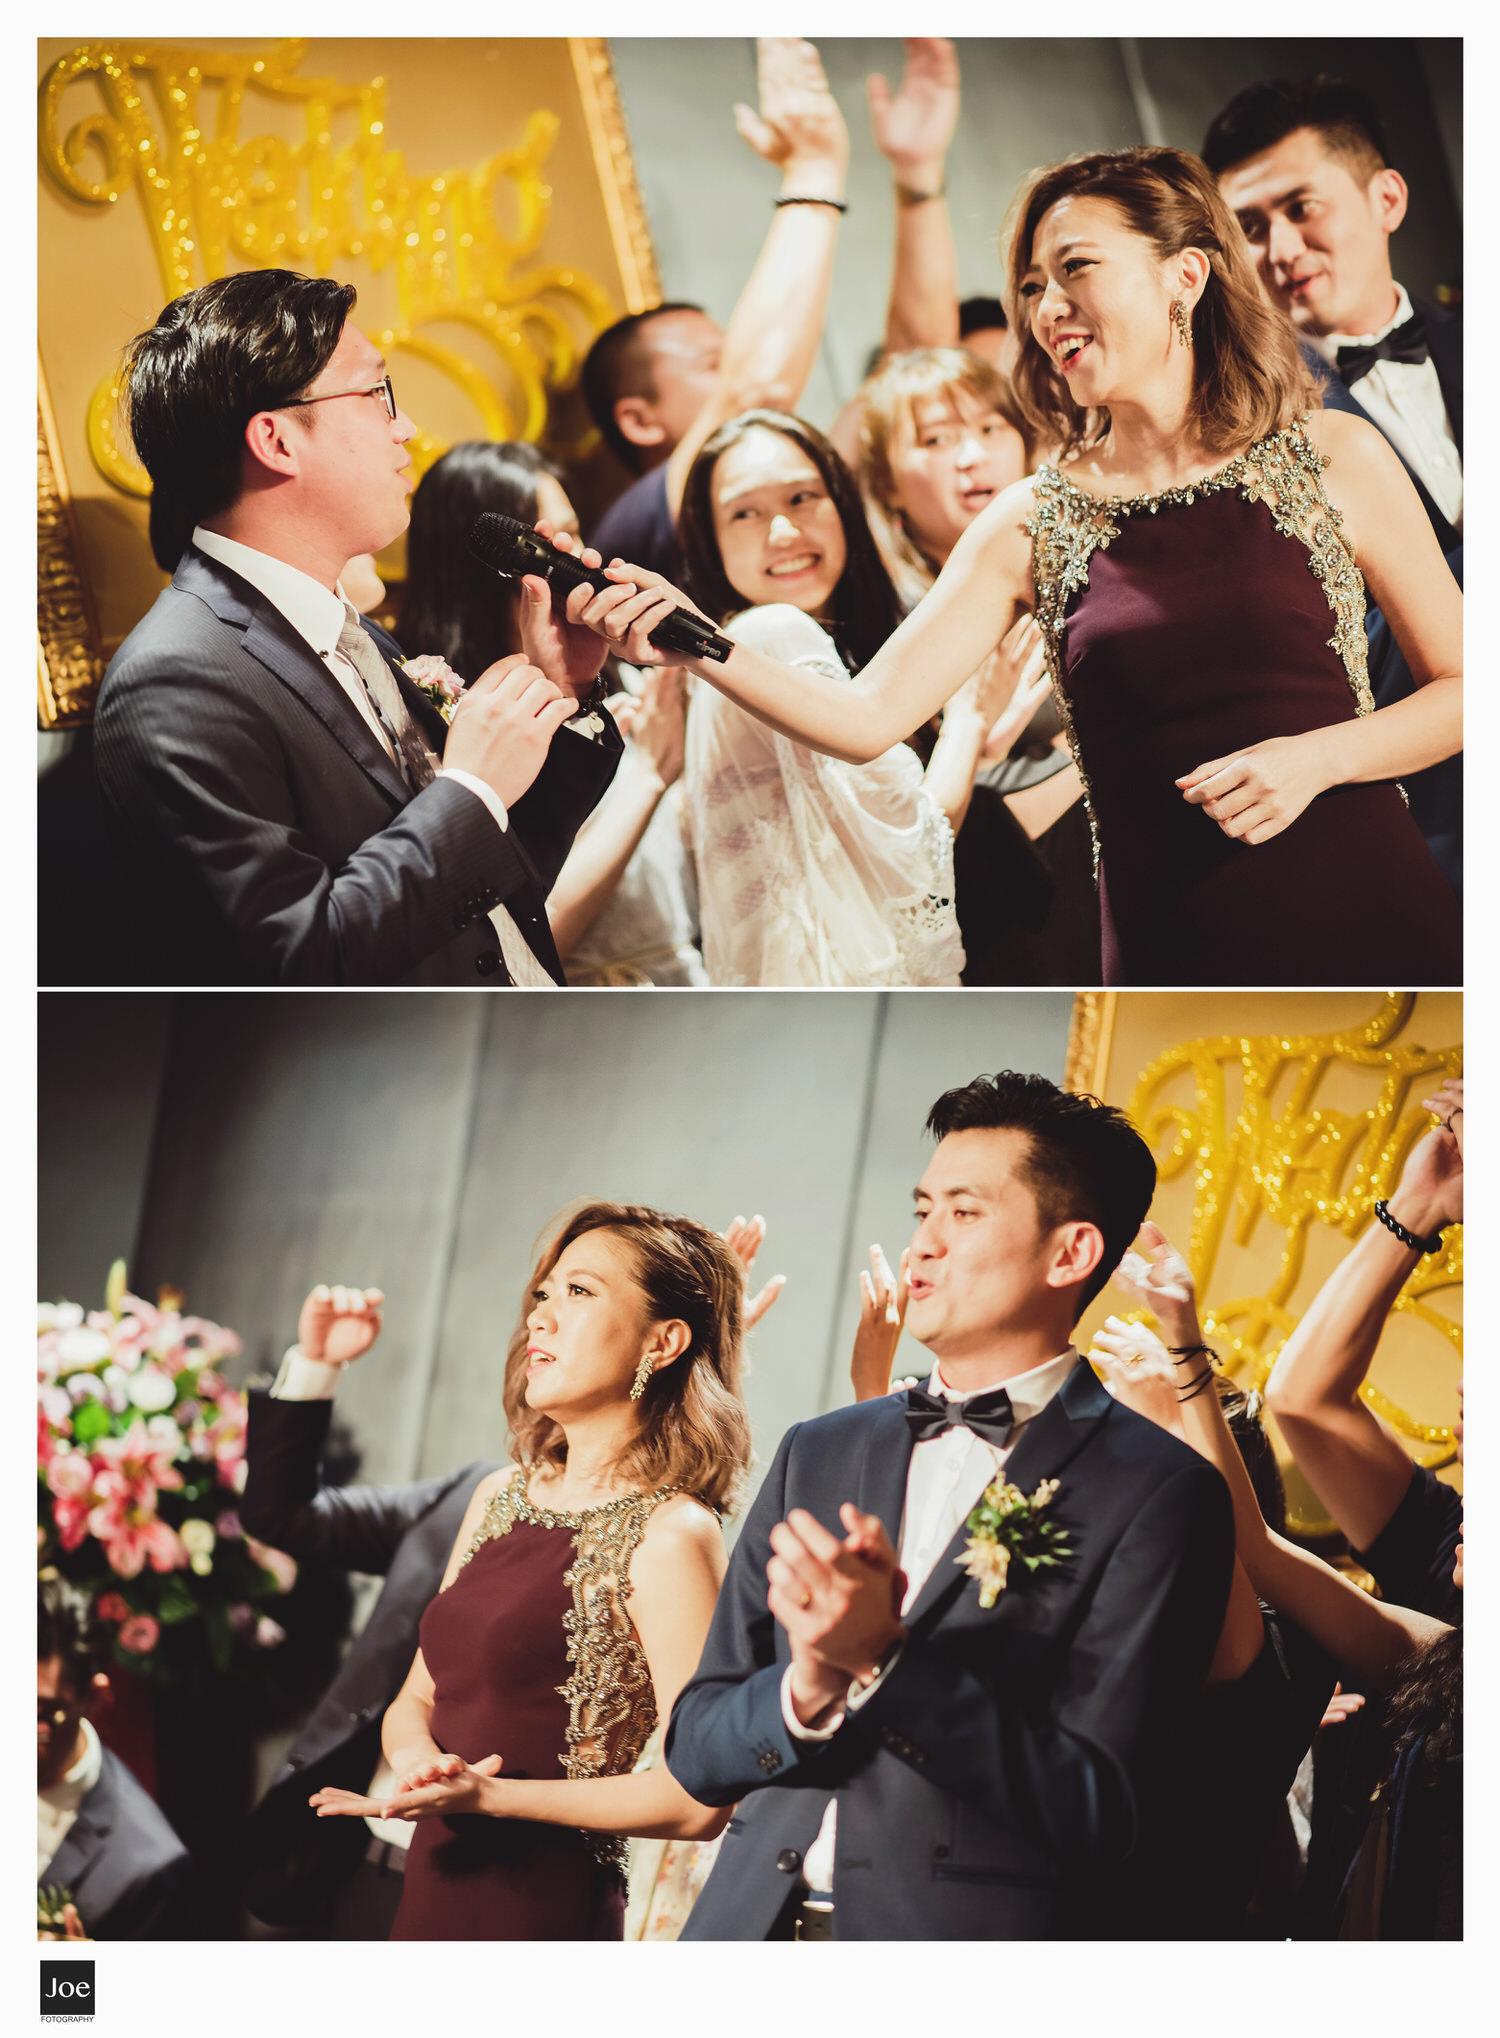 wedding-photography-shangri-la-far-eastern-plaza-hotel-ariel-sam-joe-fotography-165.jpg